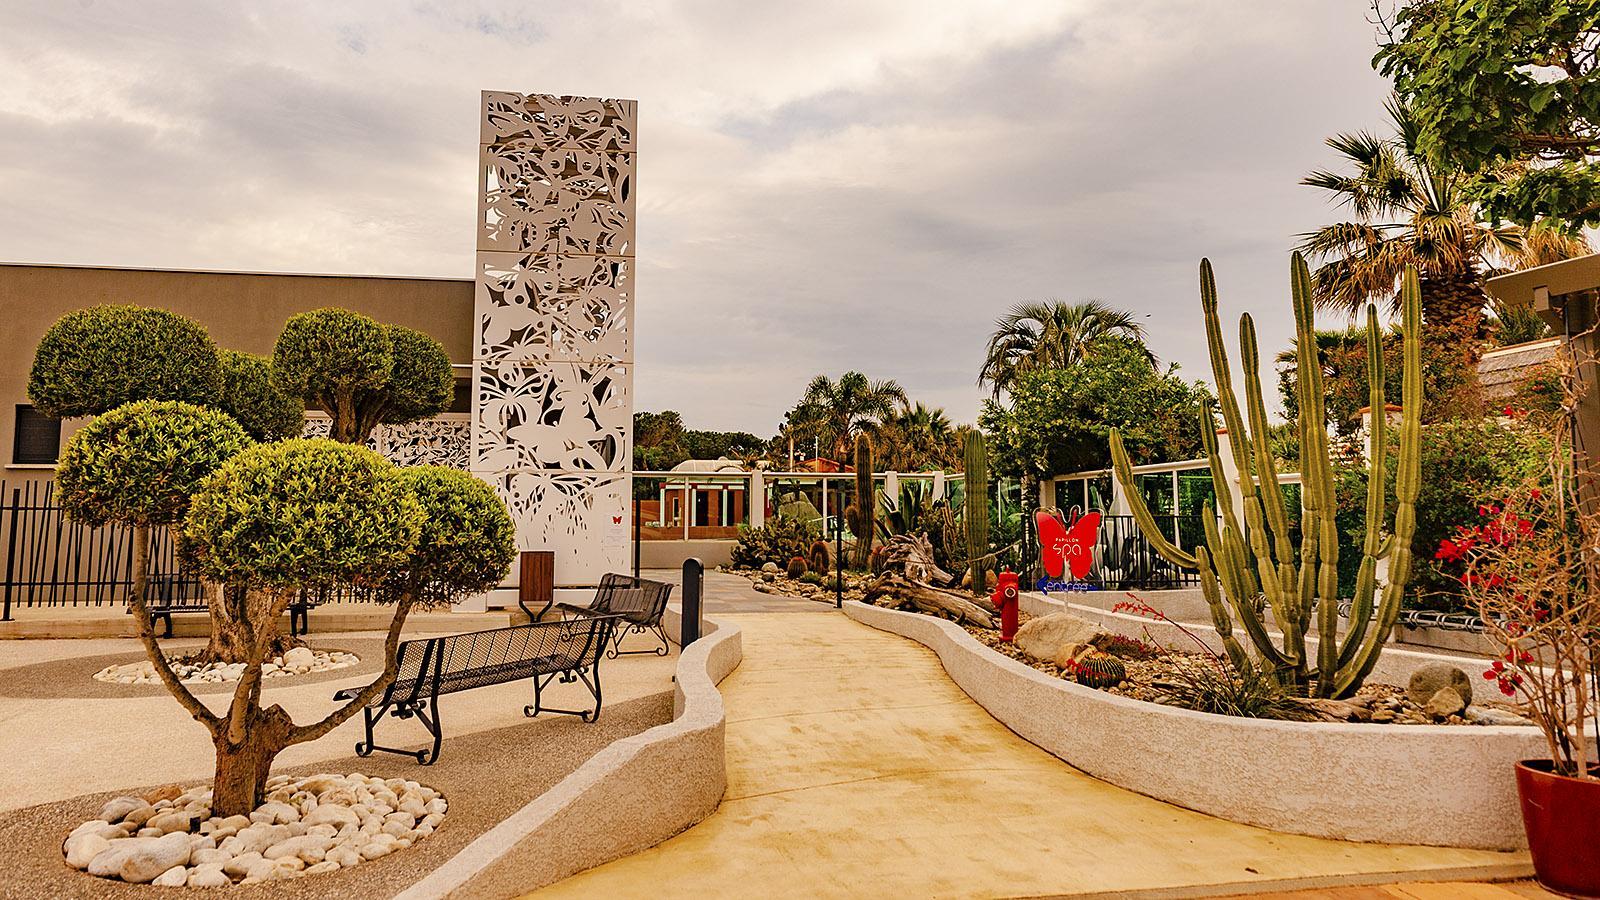 Das Papillon-Spa von Le Brasilia. Foto: Hilke Maunder